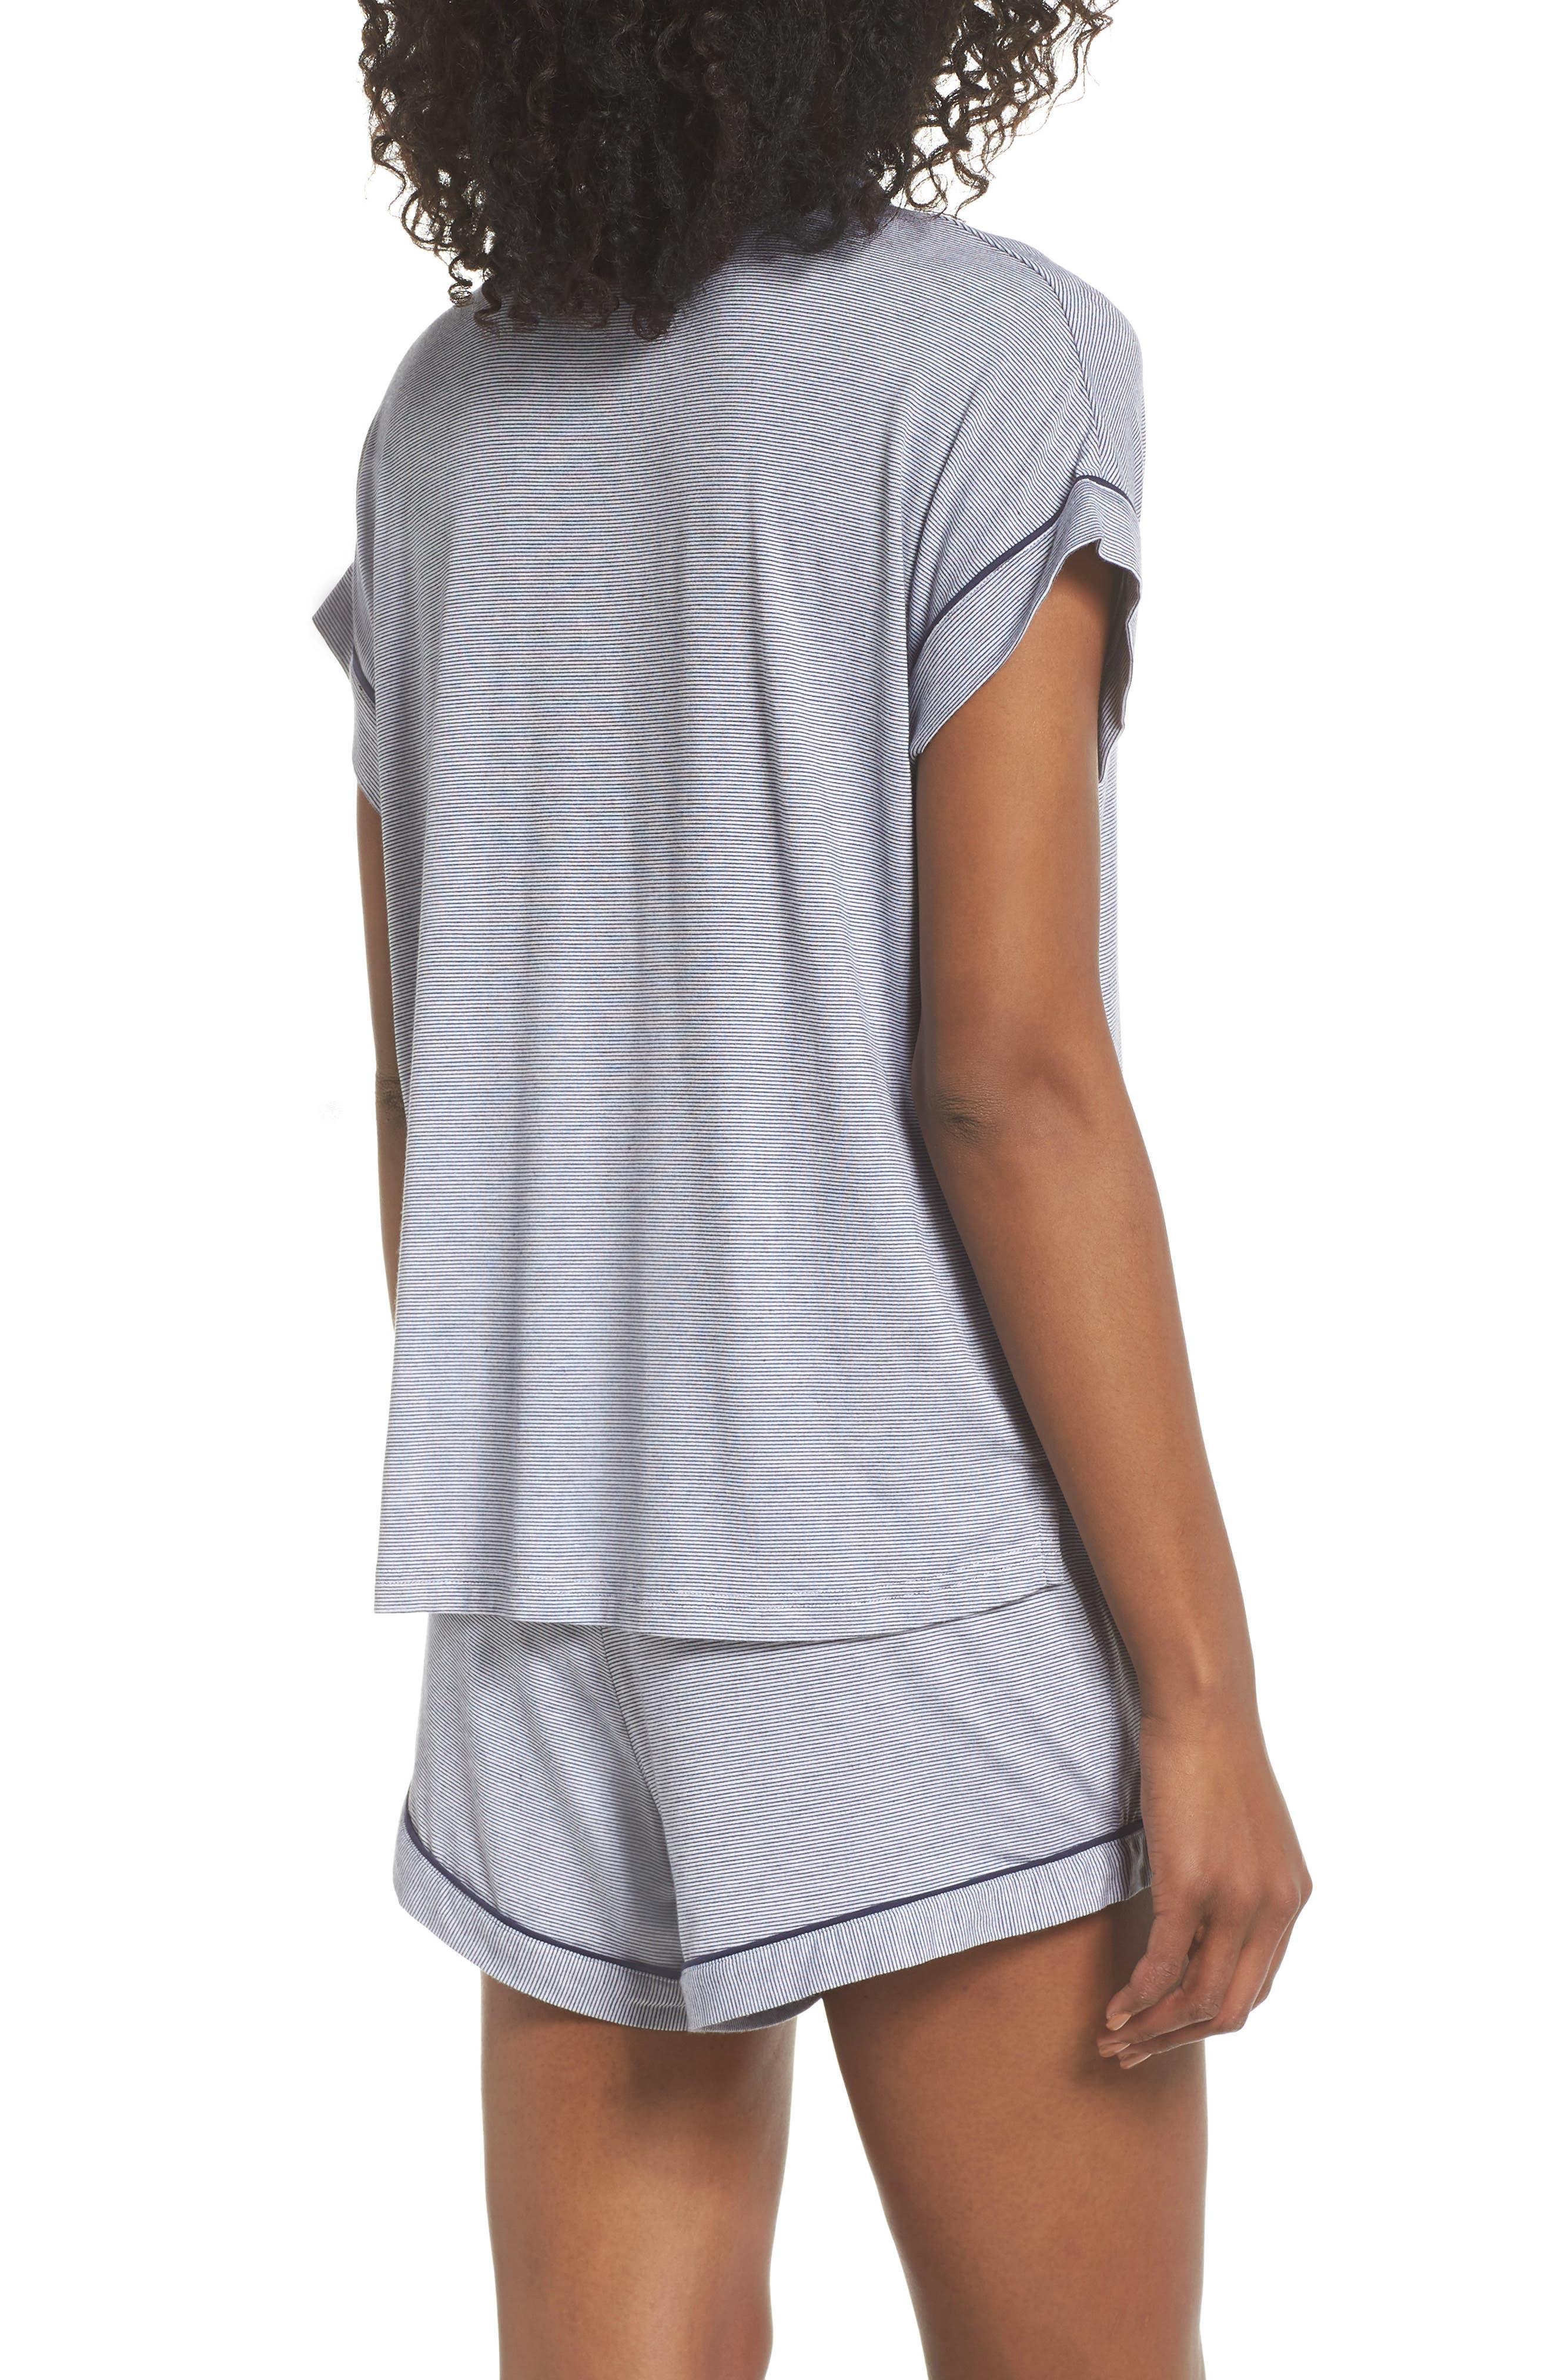 UGG<SUP>®</SUP>, Amelia Short Pajamas, Alternate thumbnail 2, color, 411